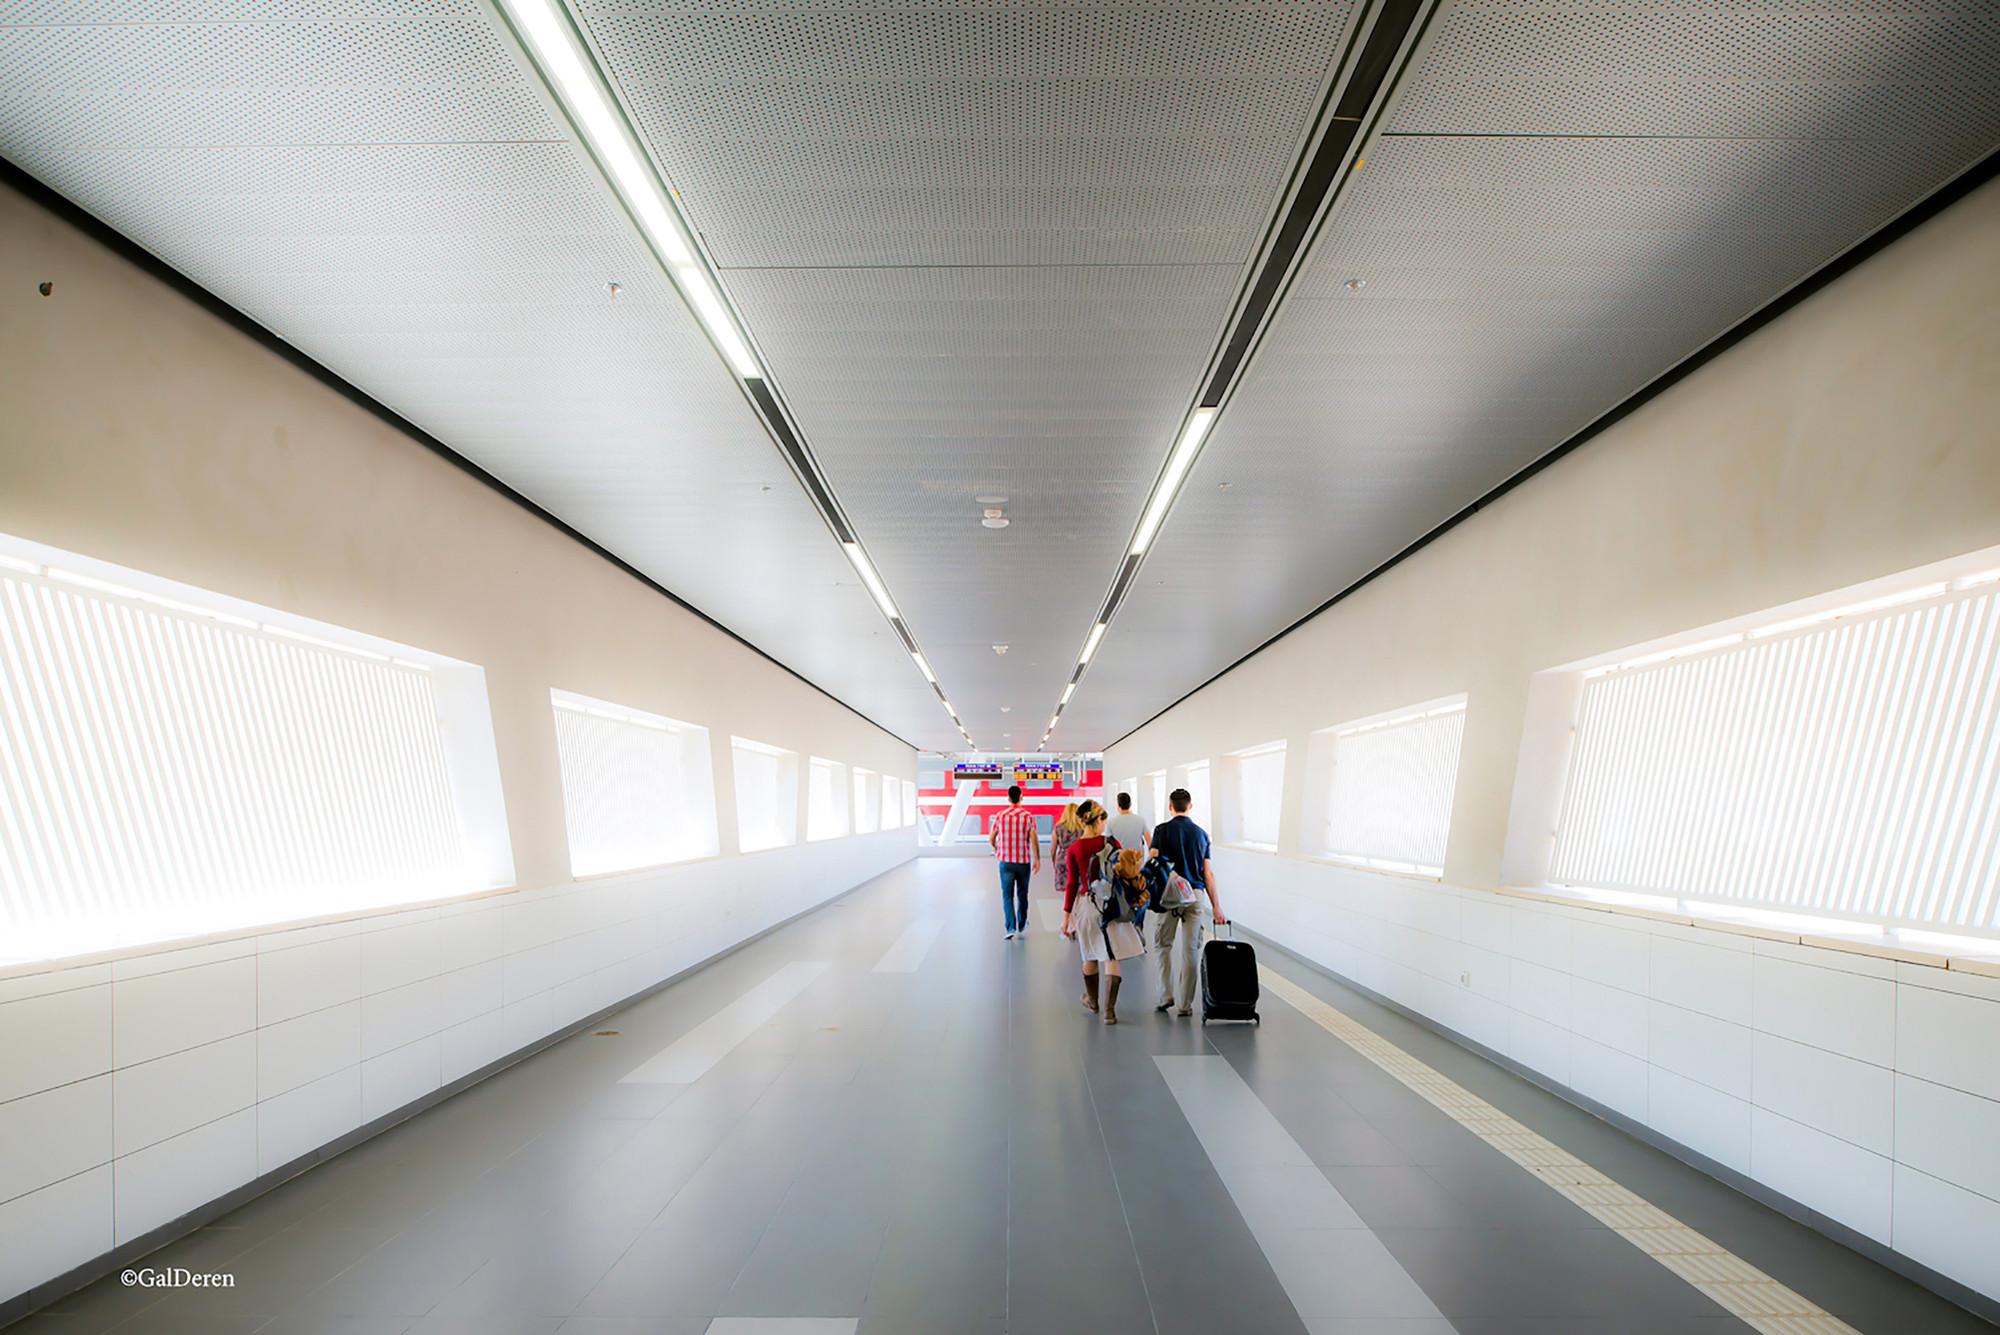 Estación de Trenes de Sderot / Ami Shinar - Amir Mann Architects and Planners